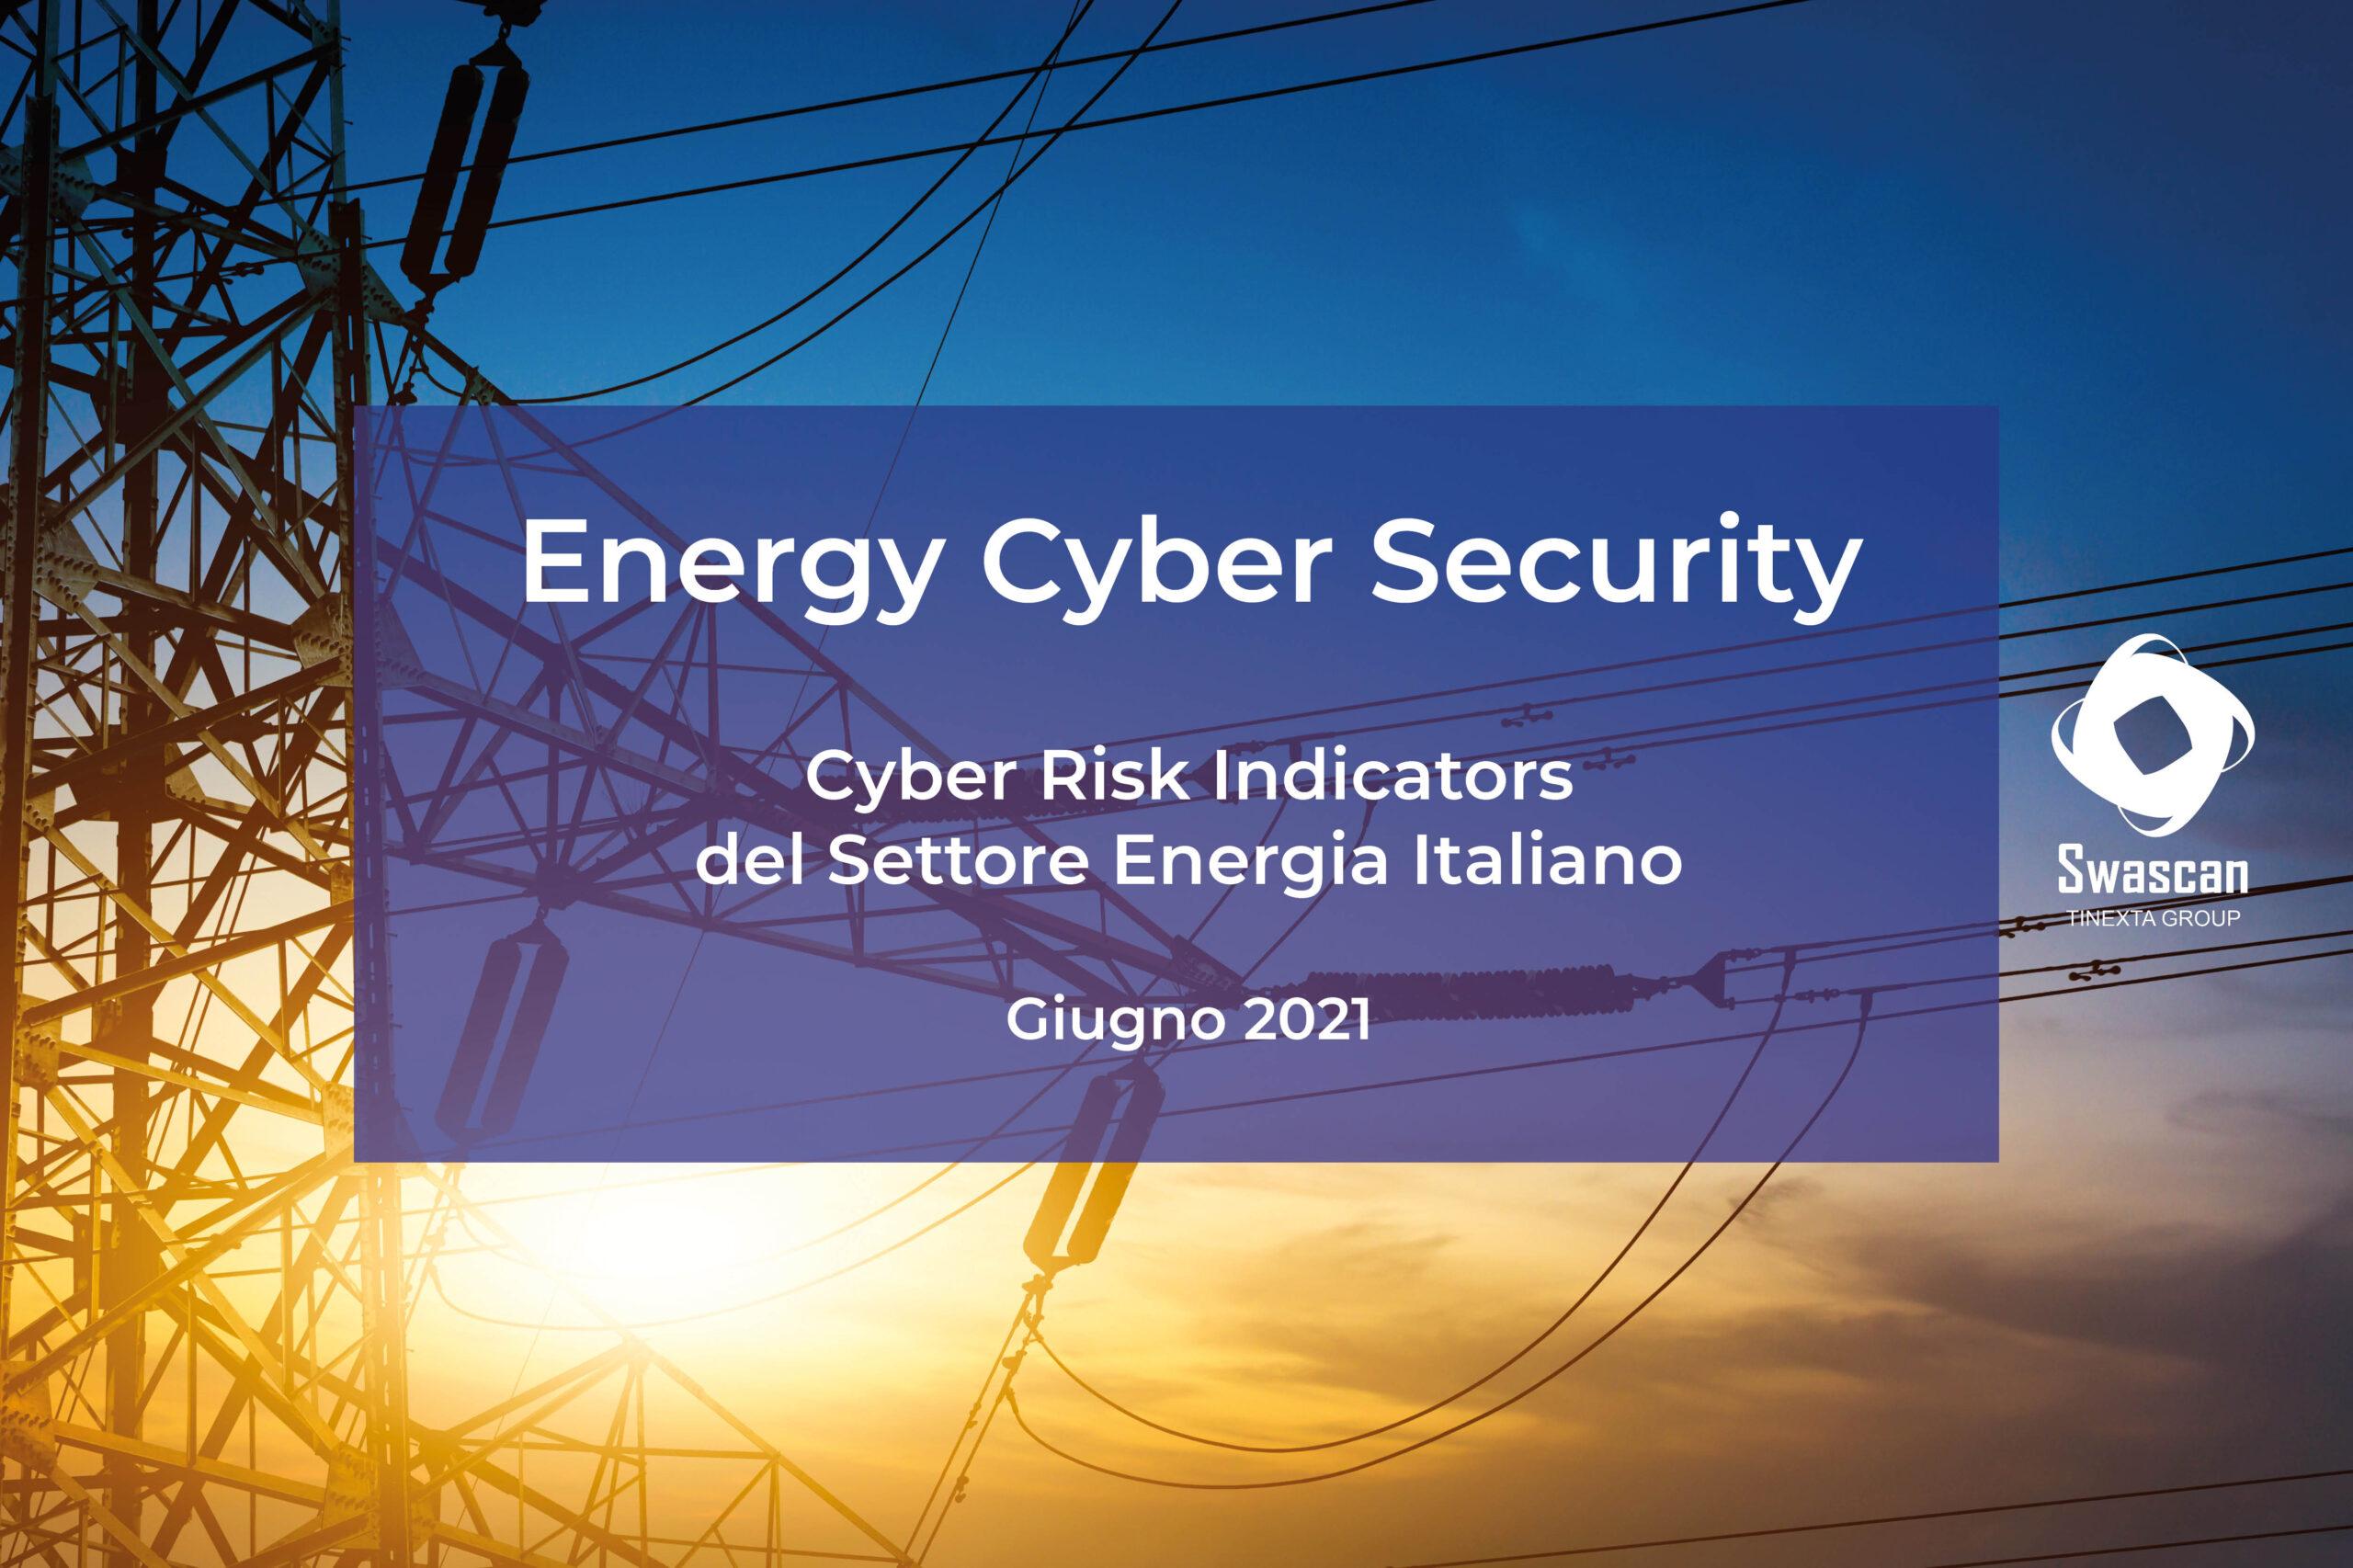 Cyber Risk Indicators: Energy (Giugno 2021)